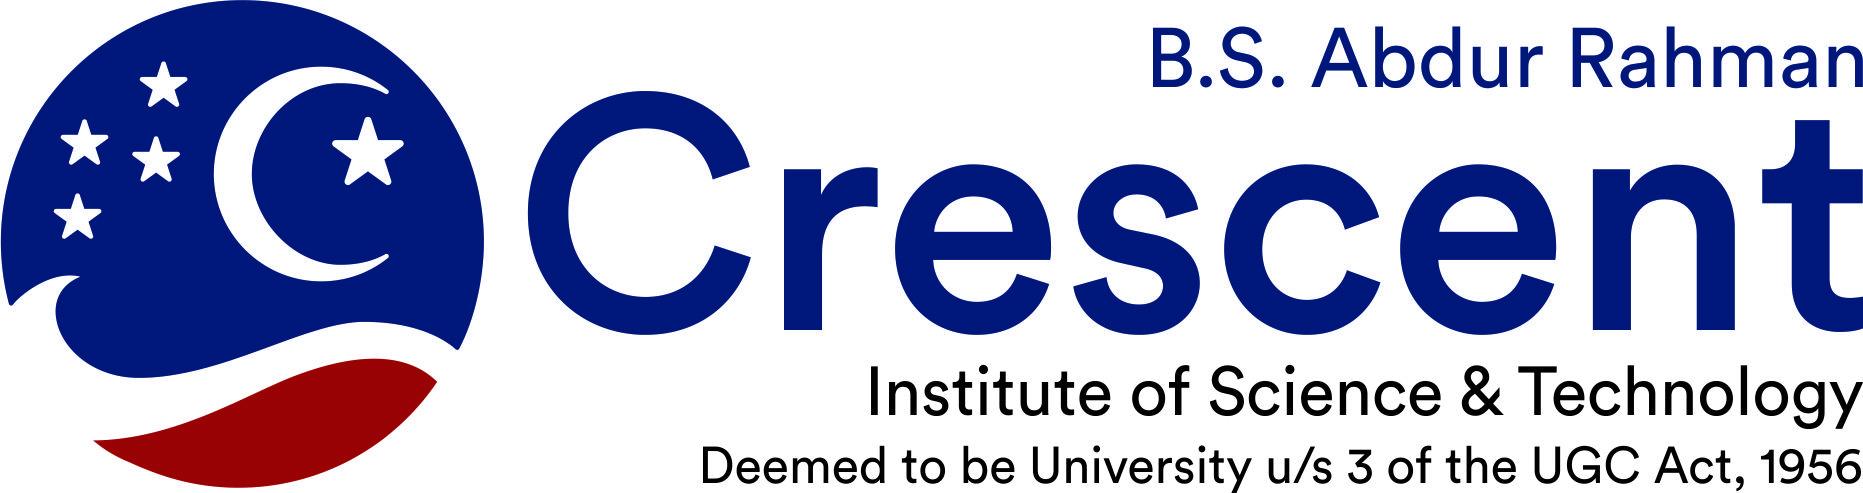 BSAU Logo